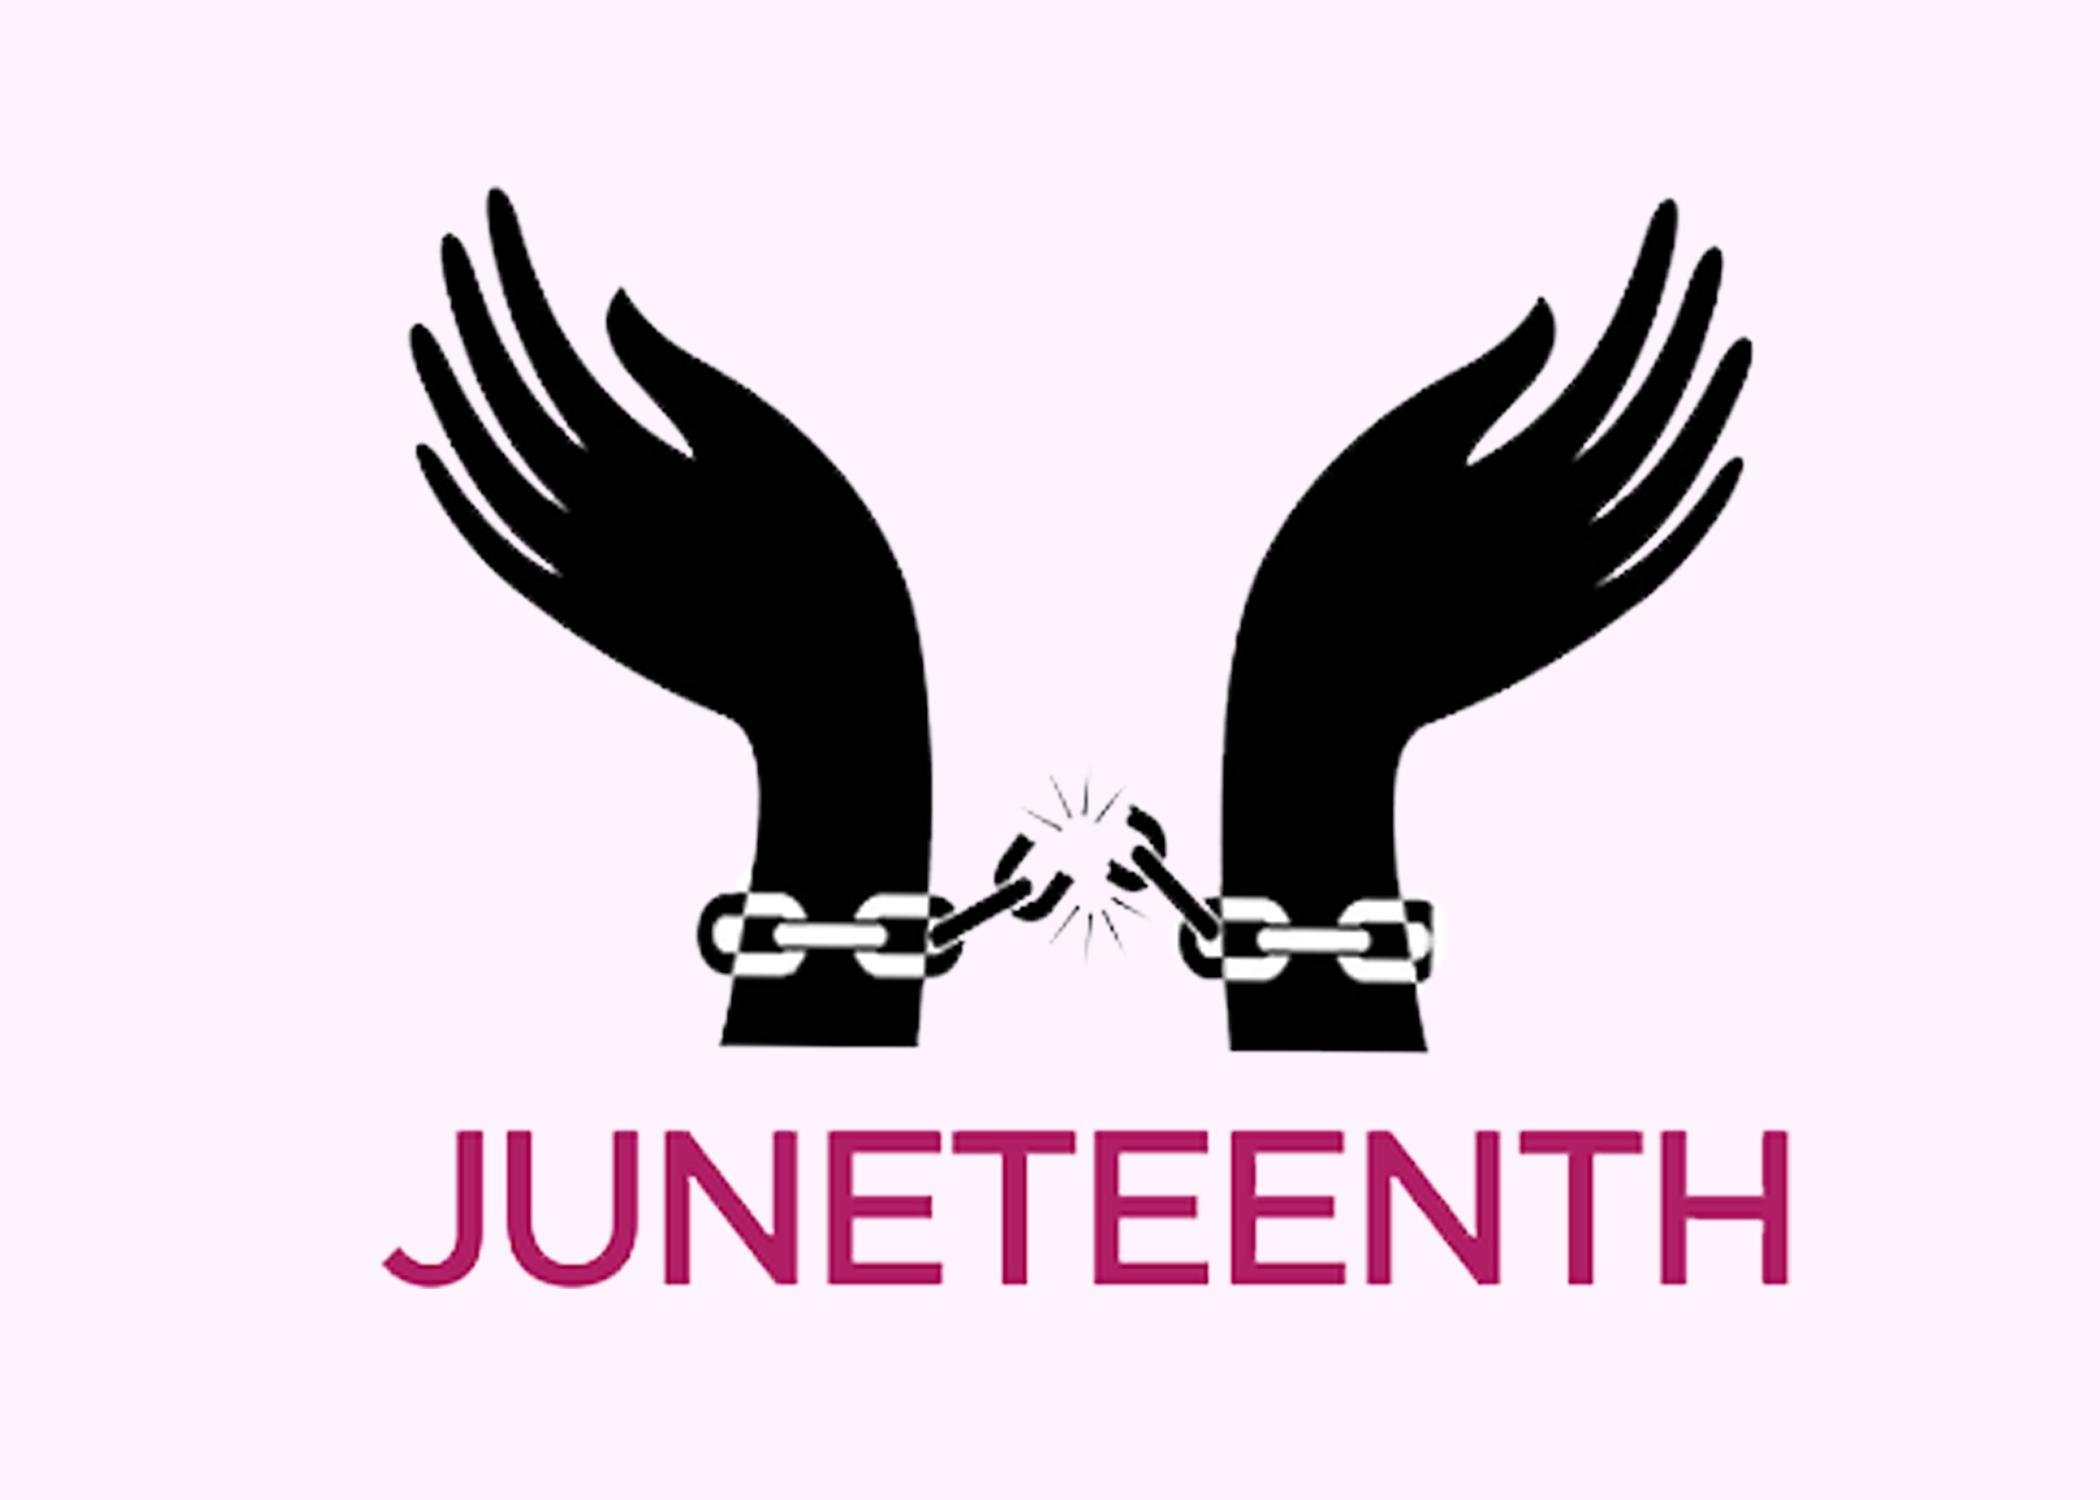 #Juneteenth #freetoedit